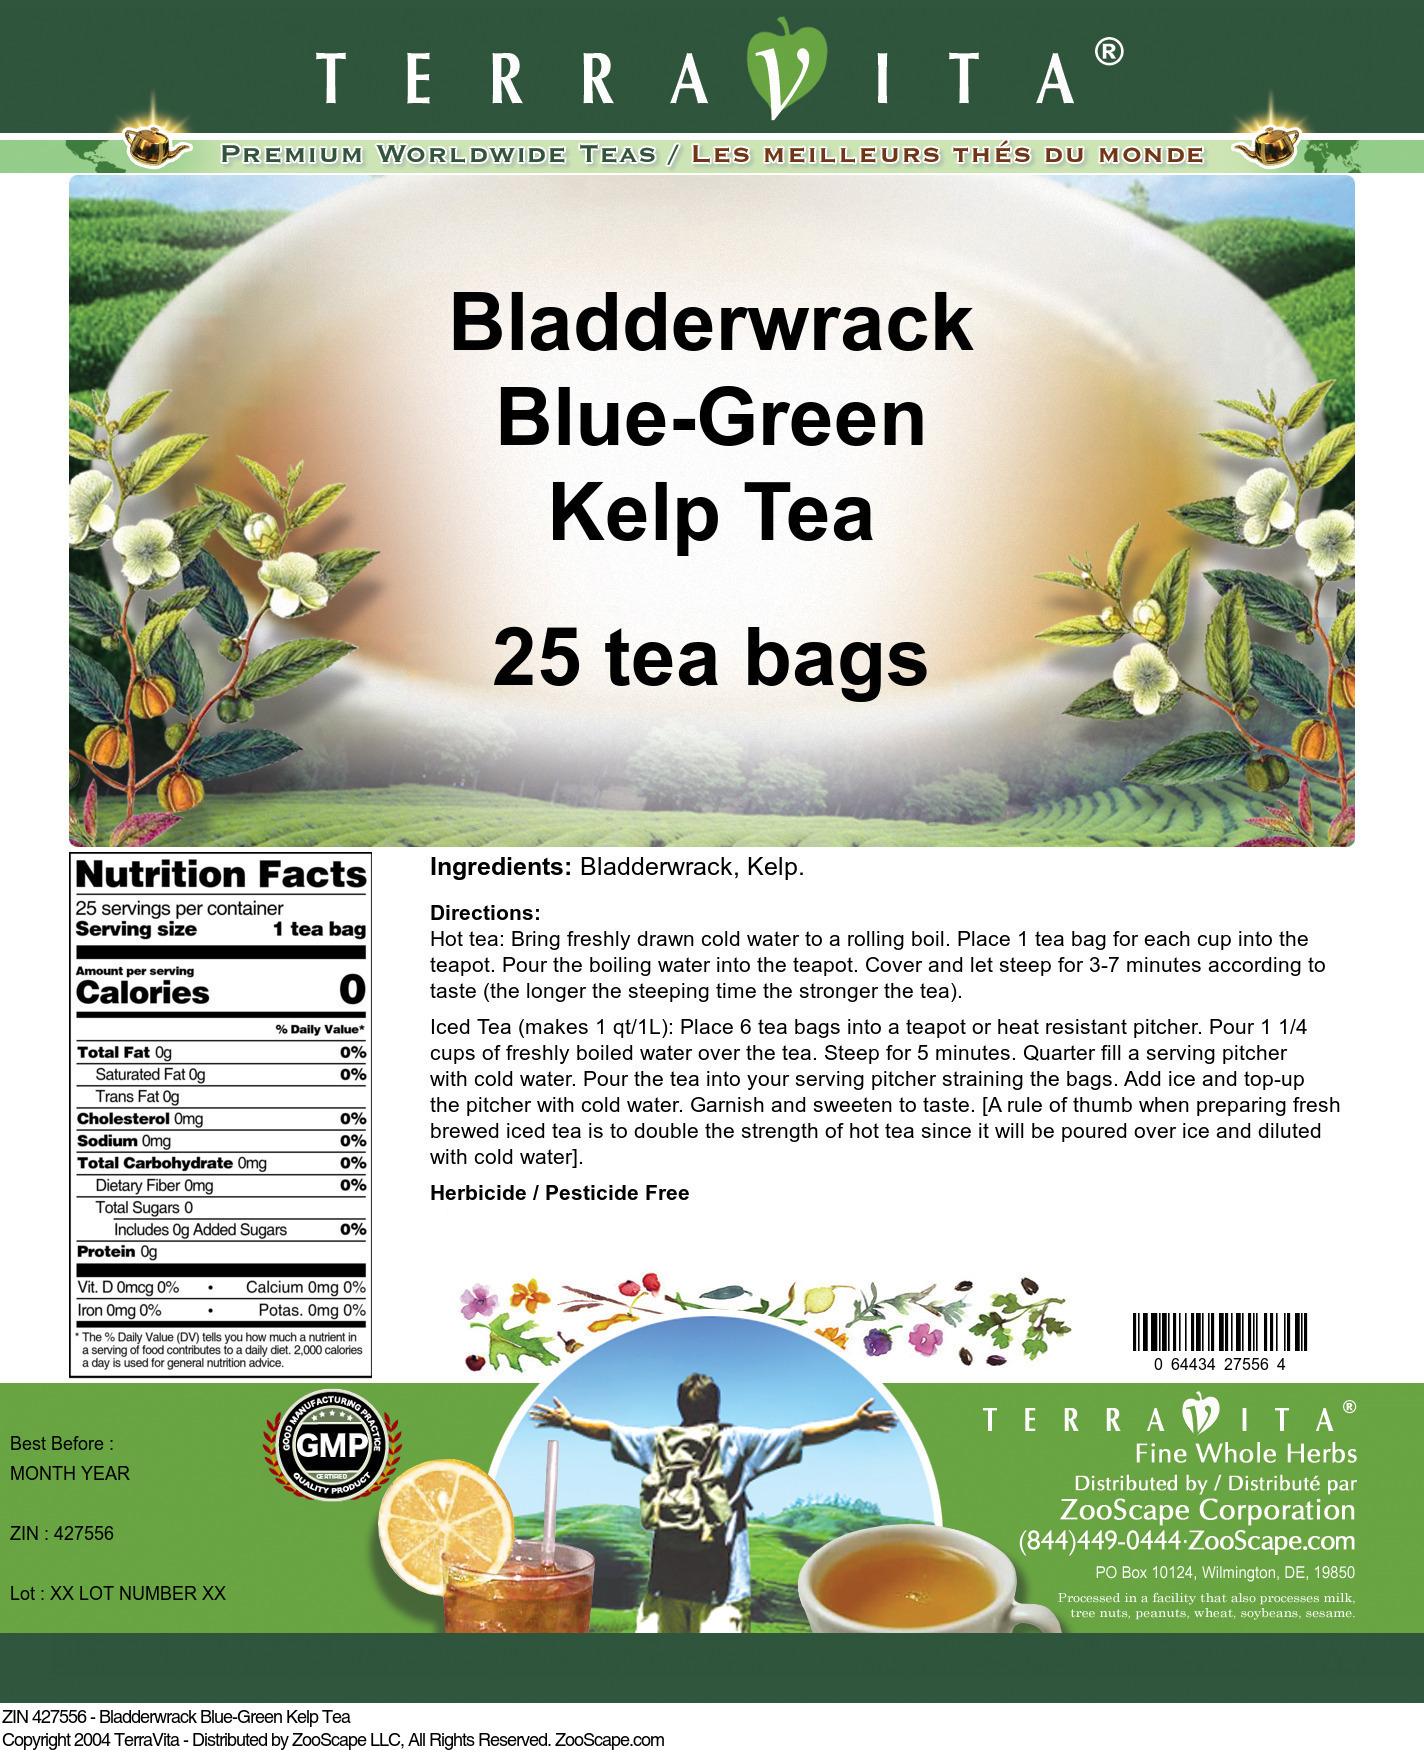 Bladderwrack Blue-Green Kelp Tea - Label